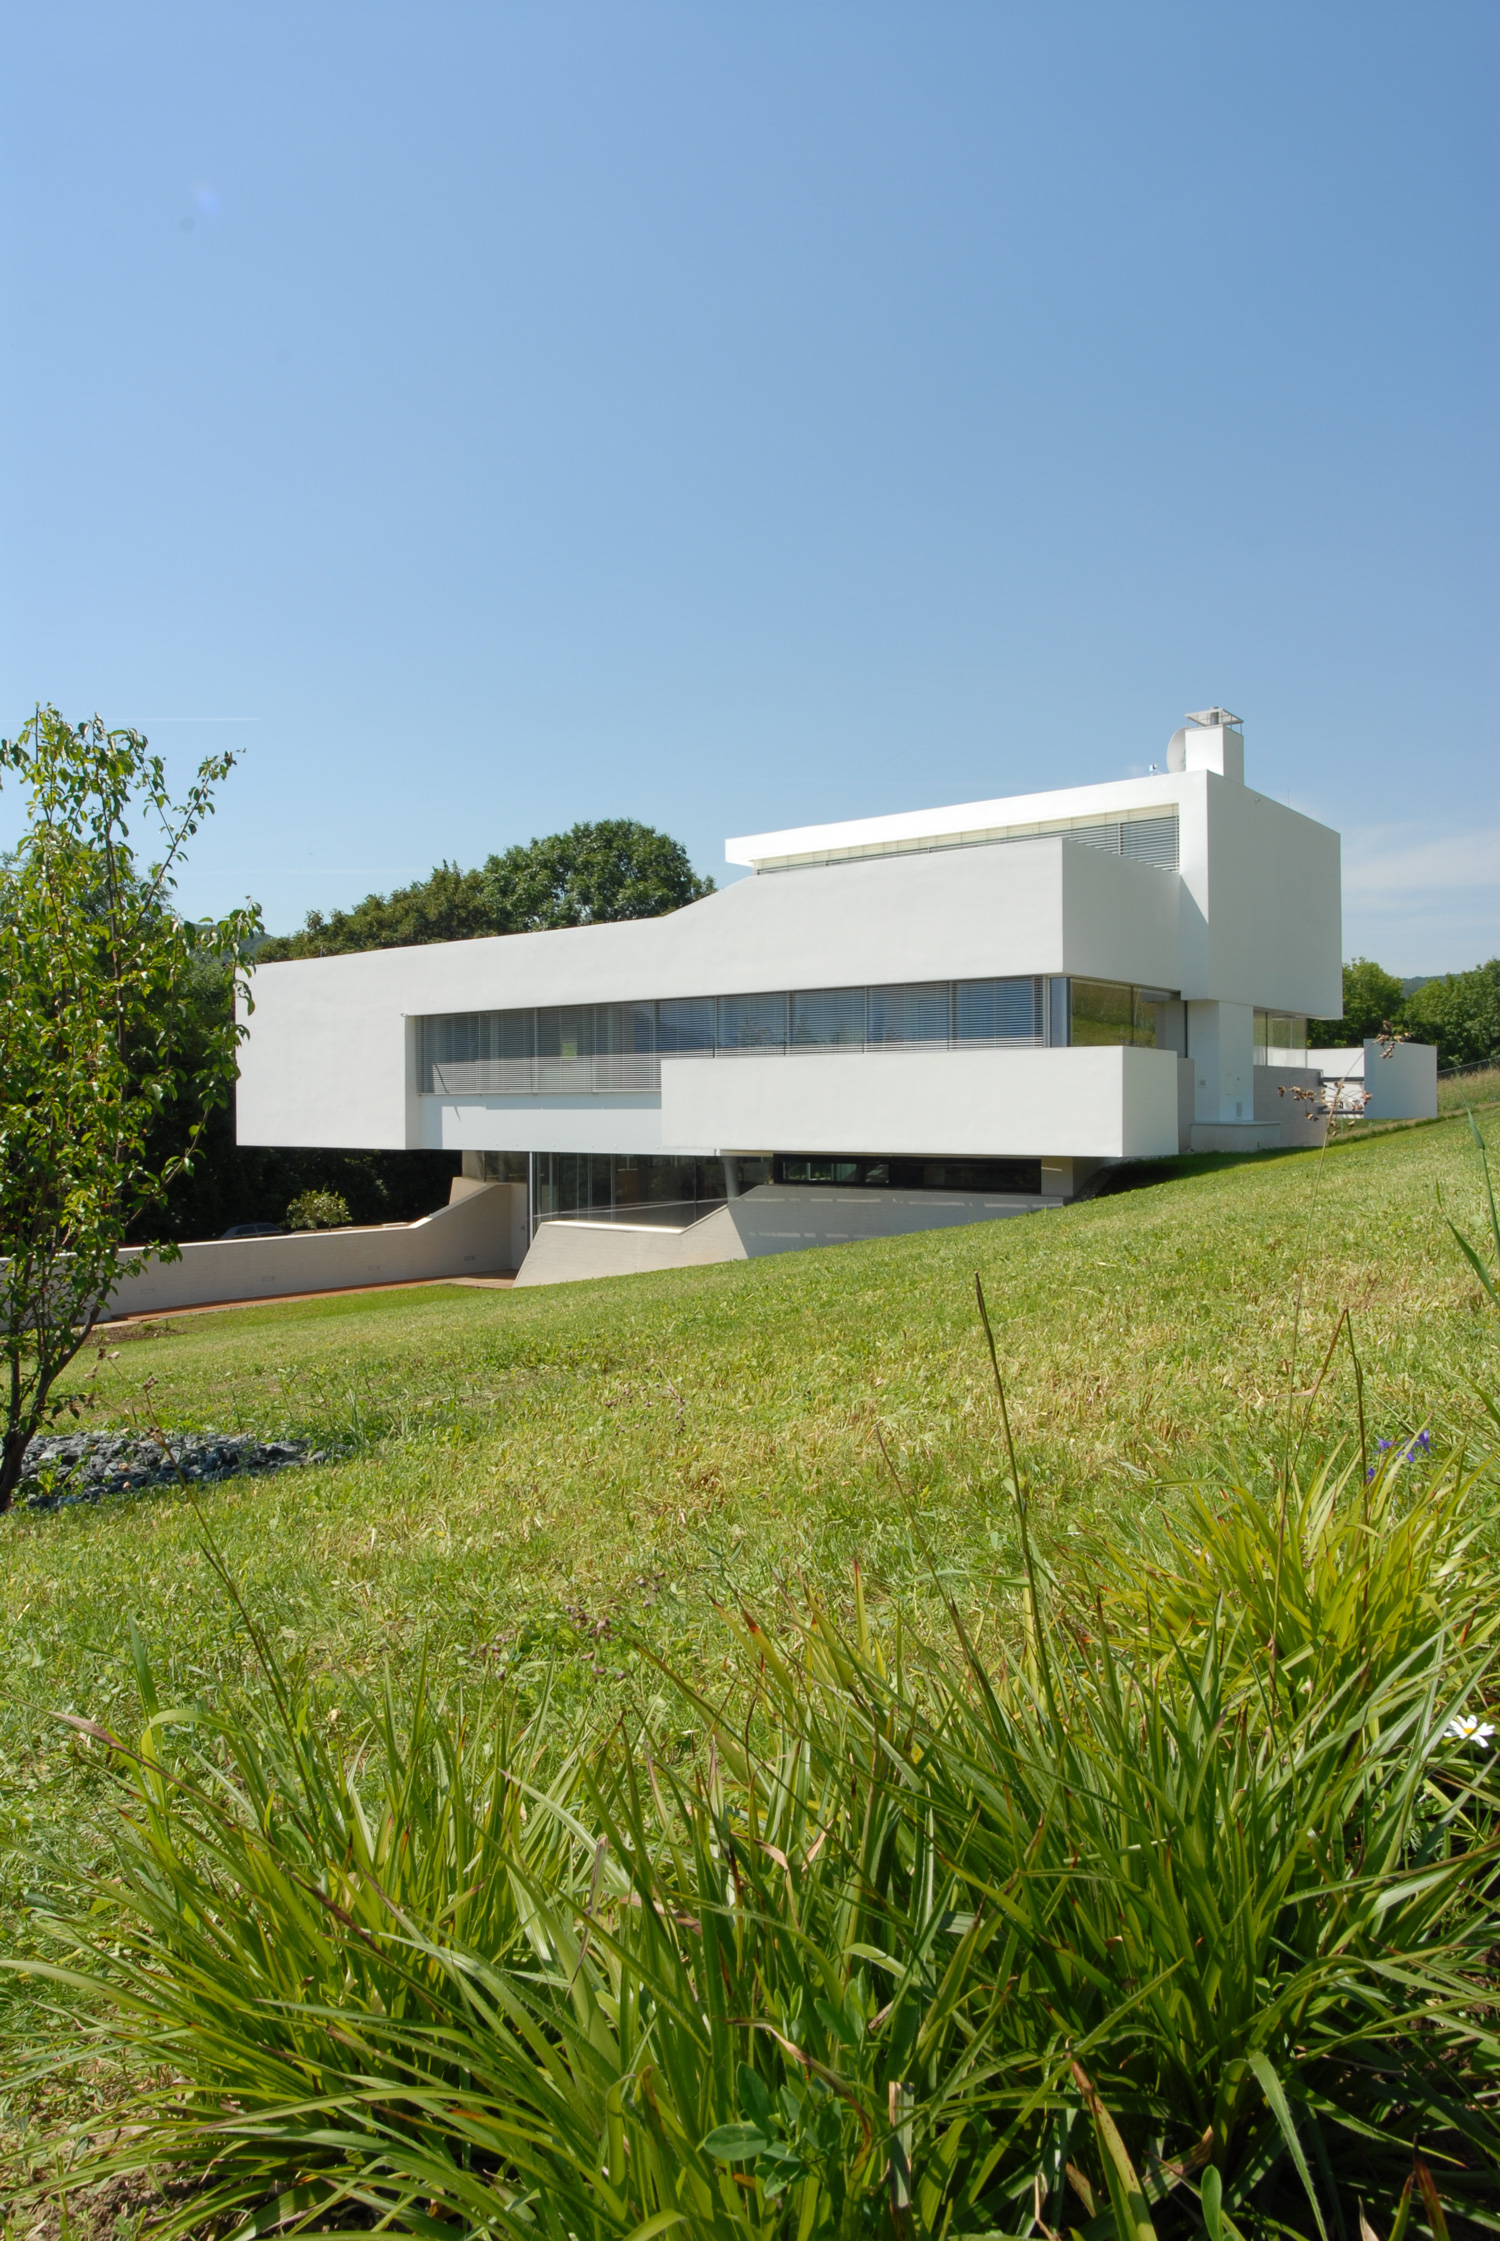 A01 architects - Residence Klosterneuburg_(c) Nadine Blanchard__web04.jpg